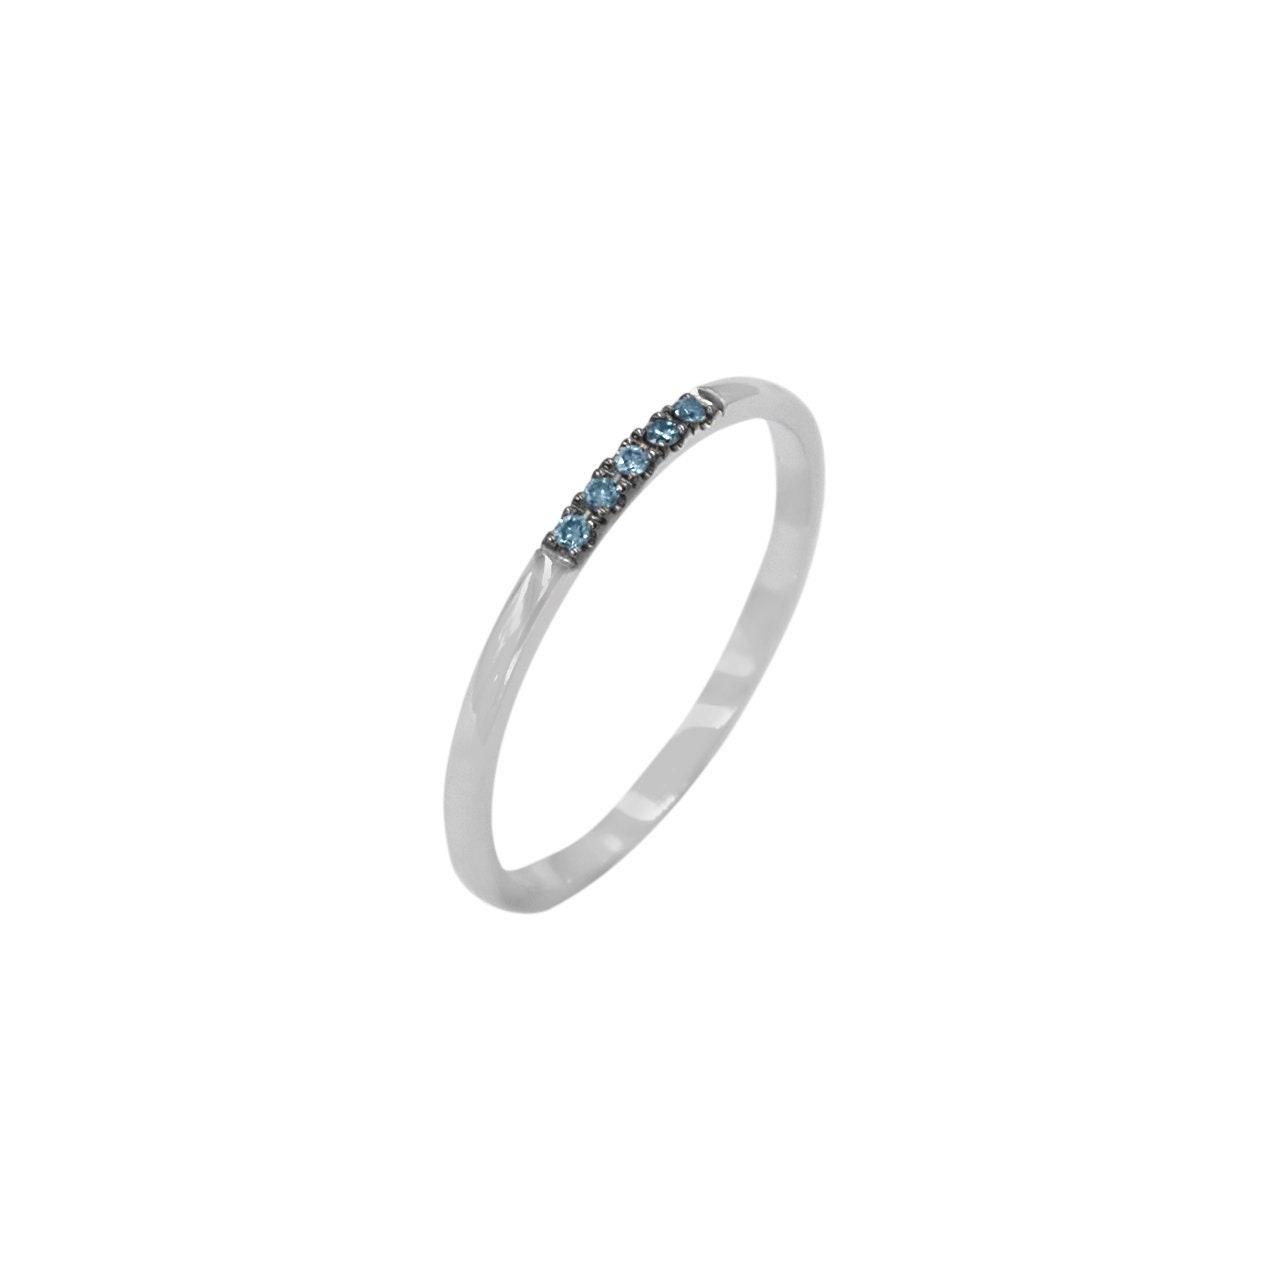 Engagement Ring Diamond Wedding Ring 1 mm Ring Thin Wedding Ring Blue Diamond Ring 3 Diamonds Band Diamond Band Diamond Rings